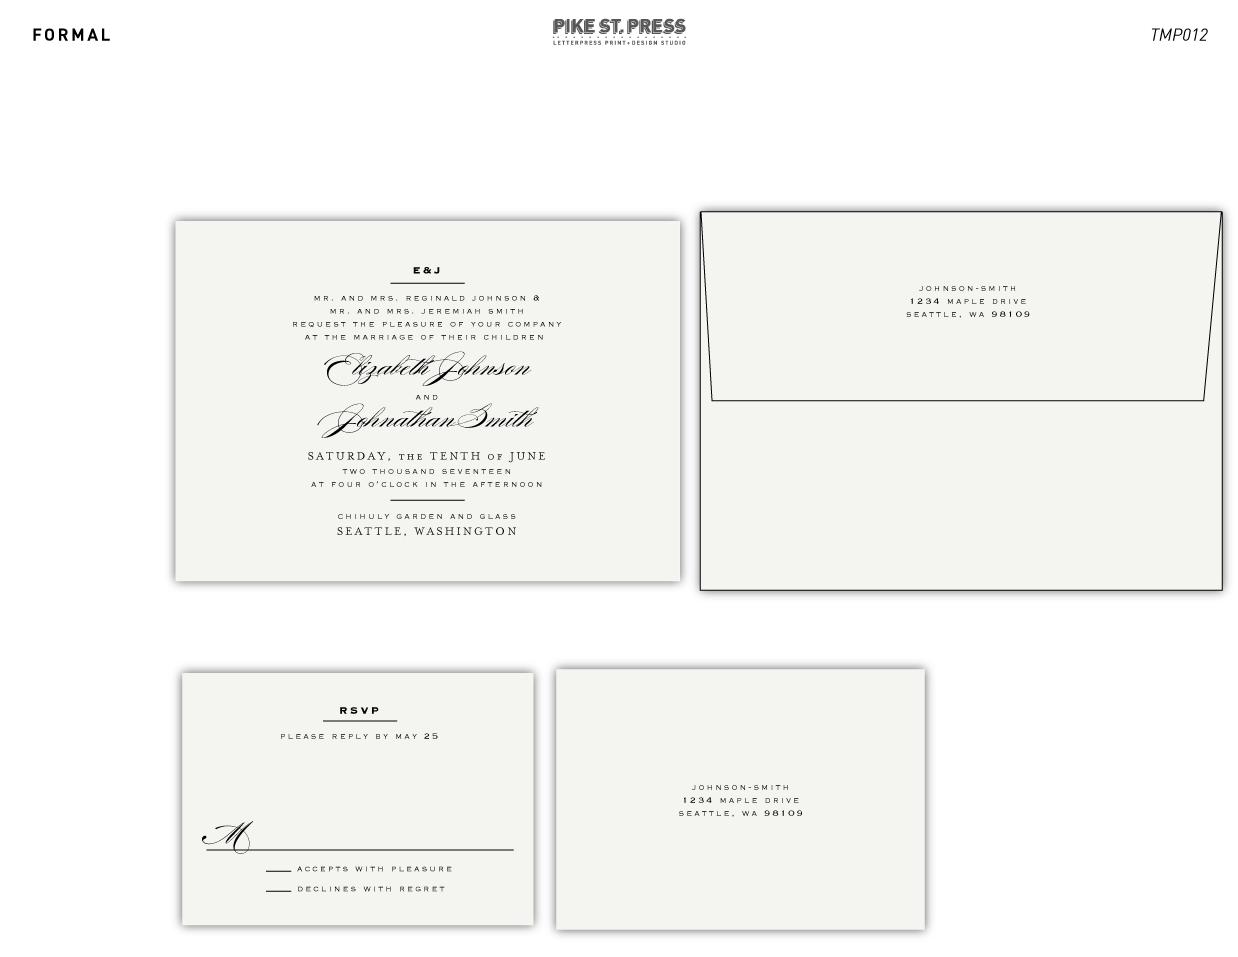 Formal TMP012 – Wedding Invitation – Pike Street Press